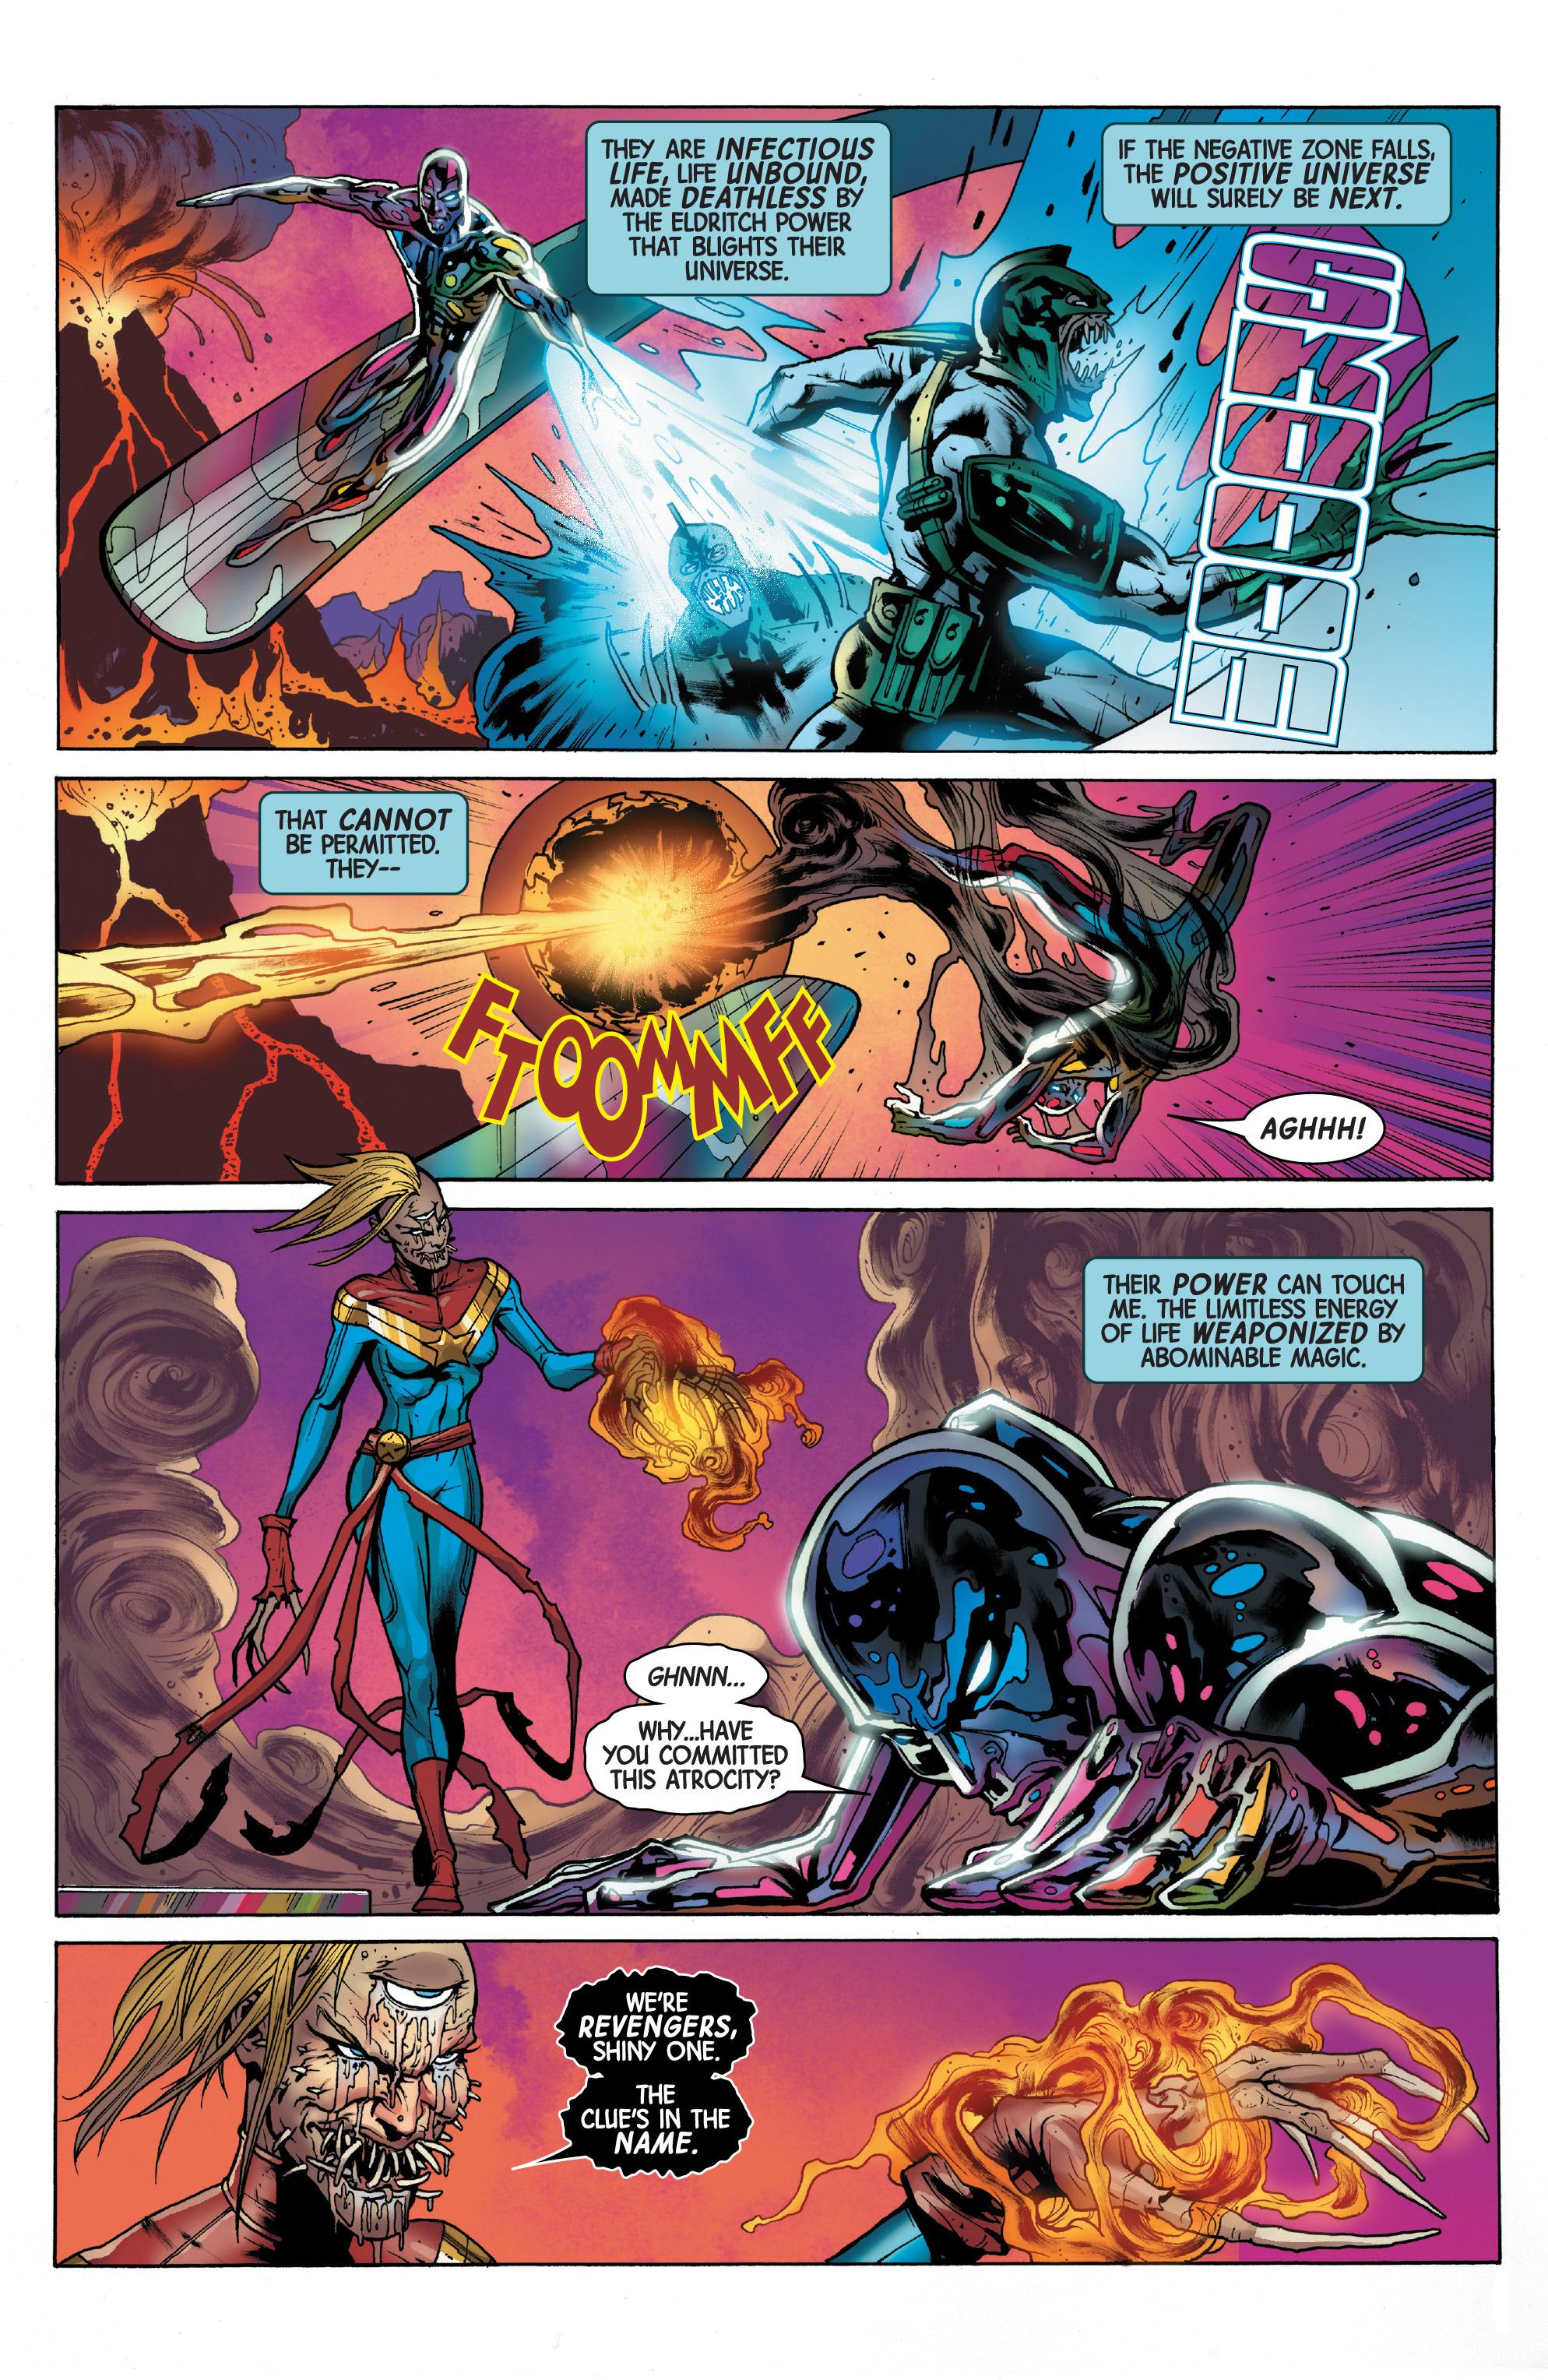 2020 MARVEL Comics Scourge VF//NM Book Silver Surfer #1b ⭐️ ANNIHILATION